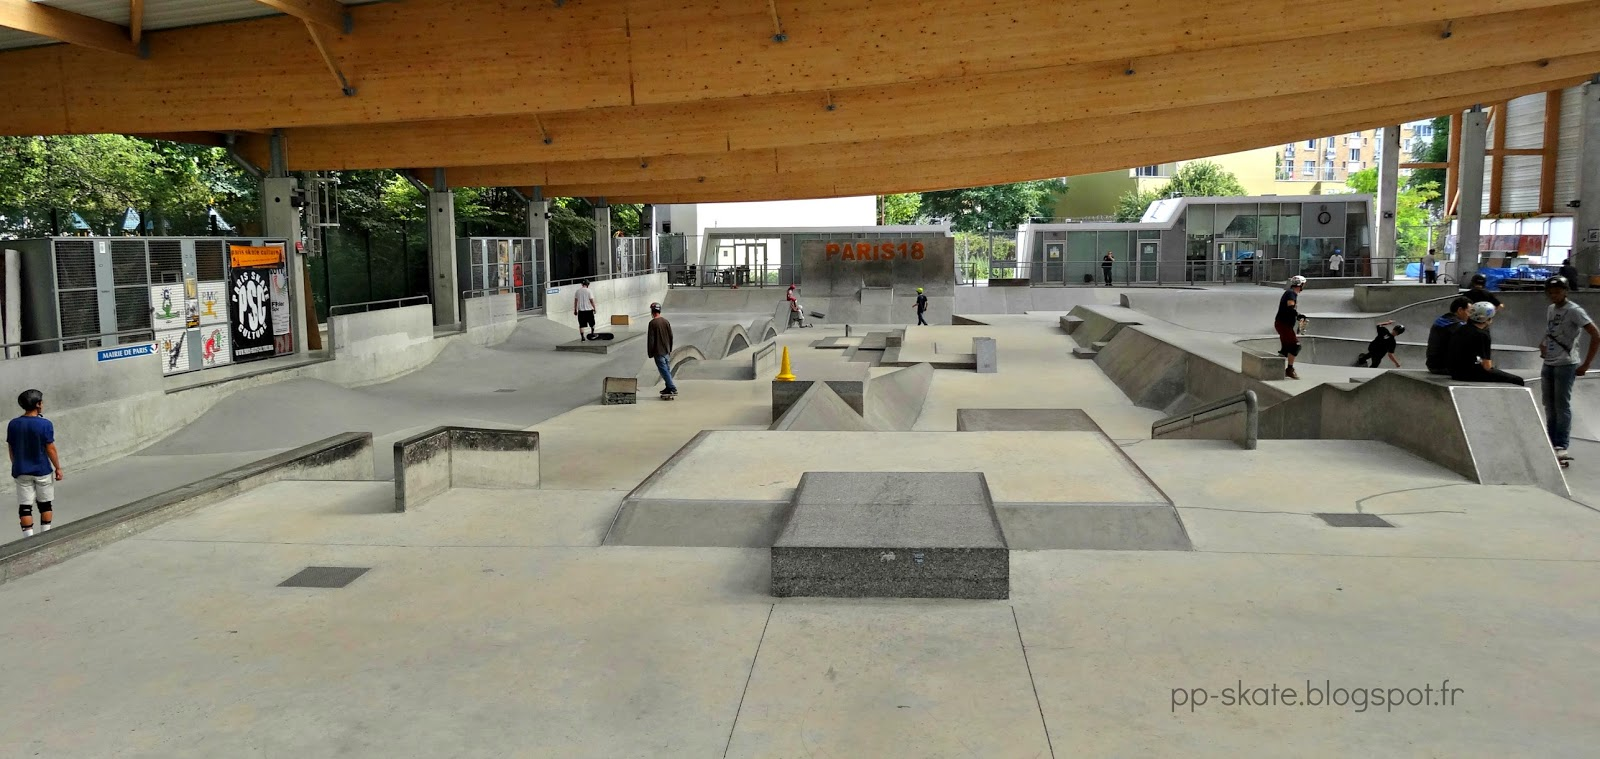 Skatepark paris porte chapelle